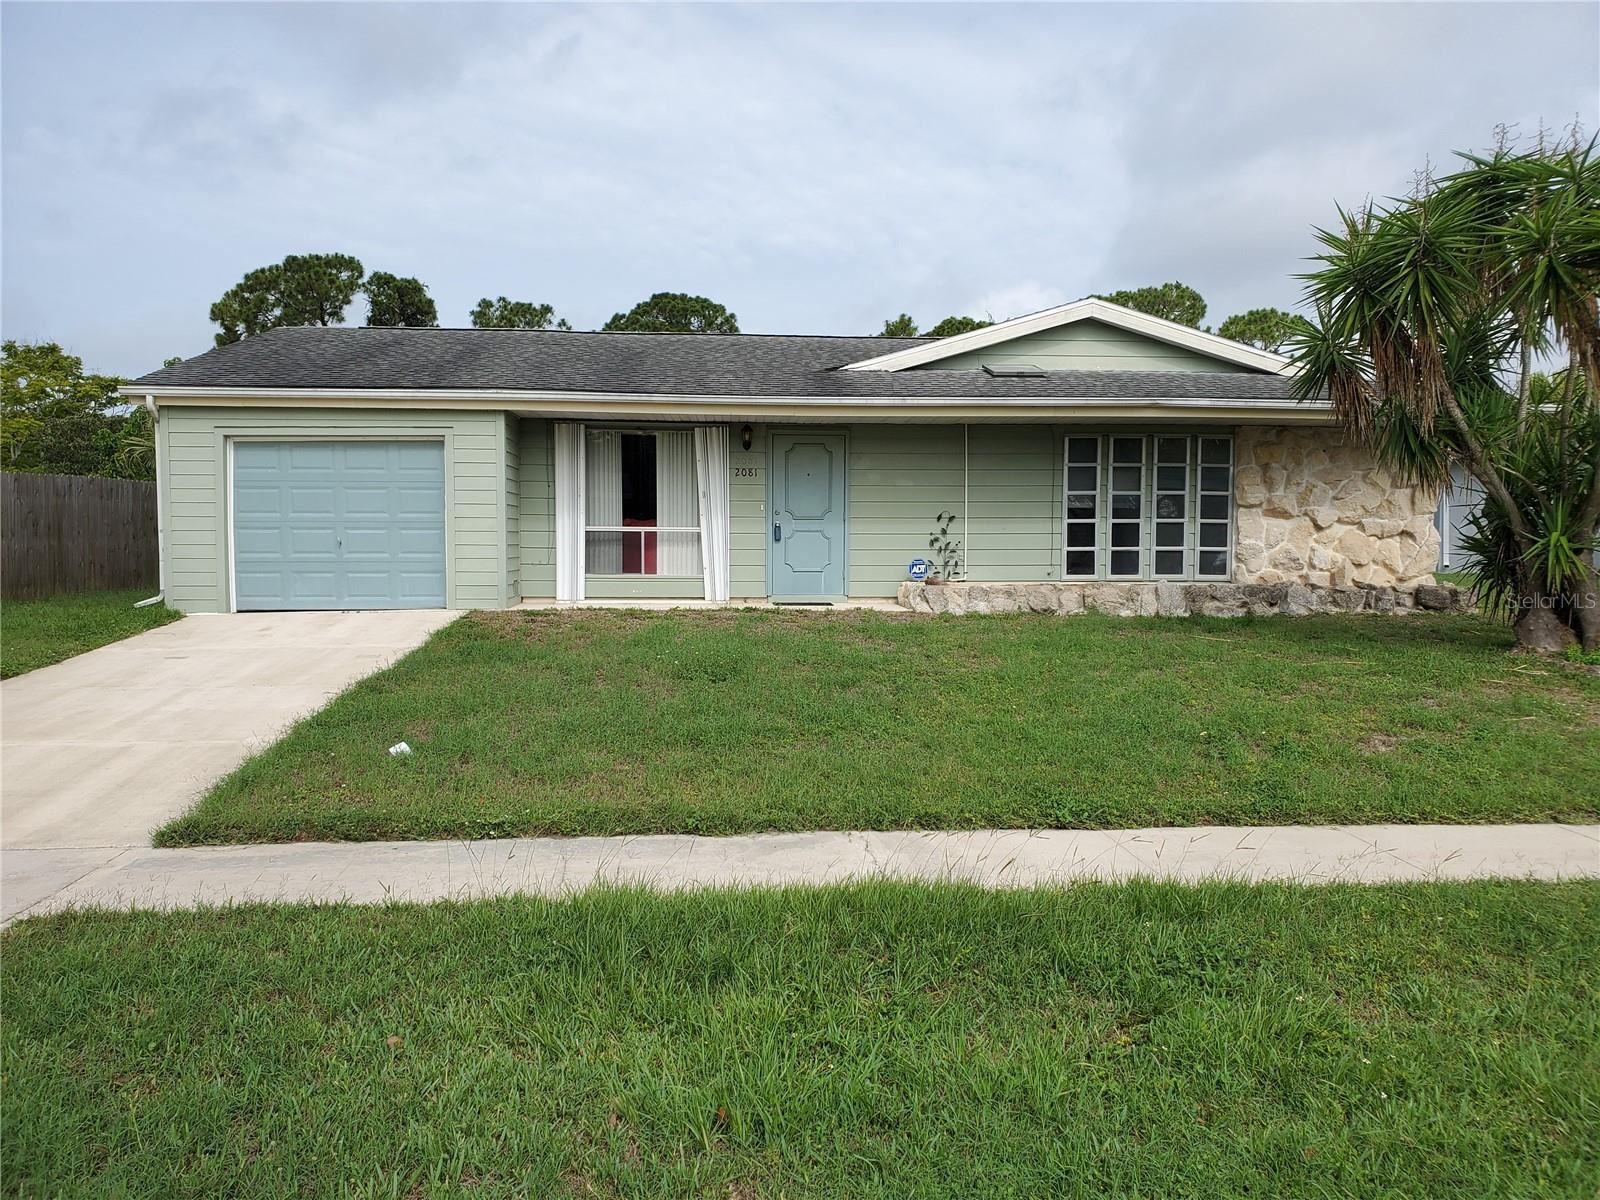 2081 HARIET ST, Port Charlotte, FL 33952 - #: C7444882